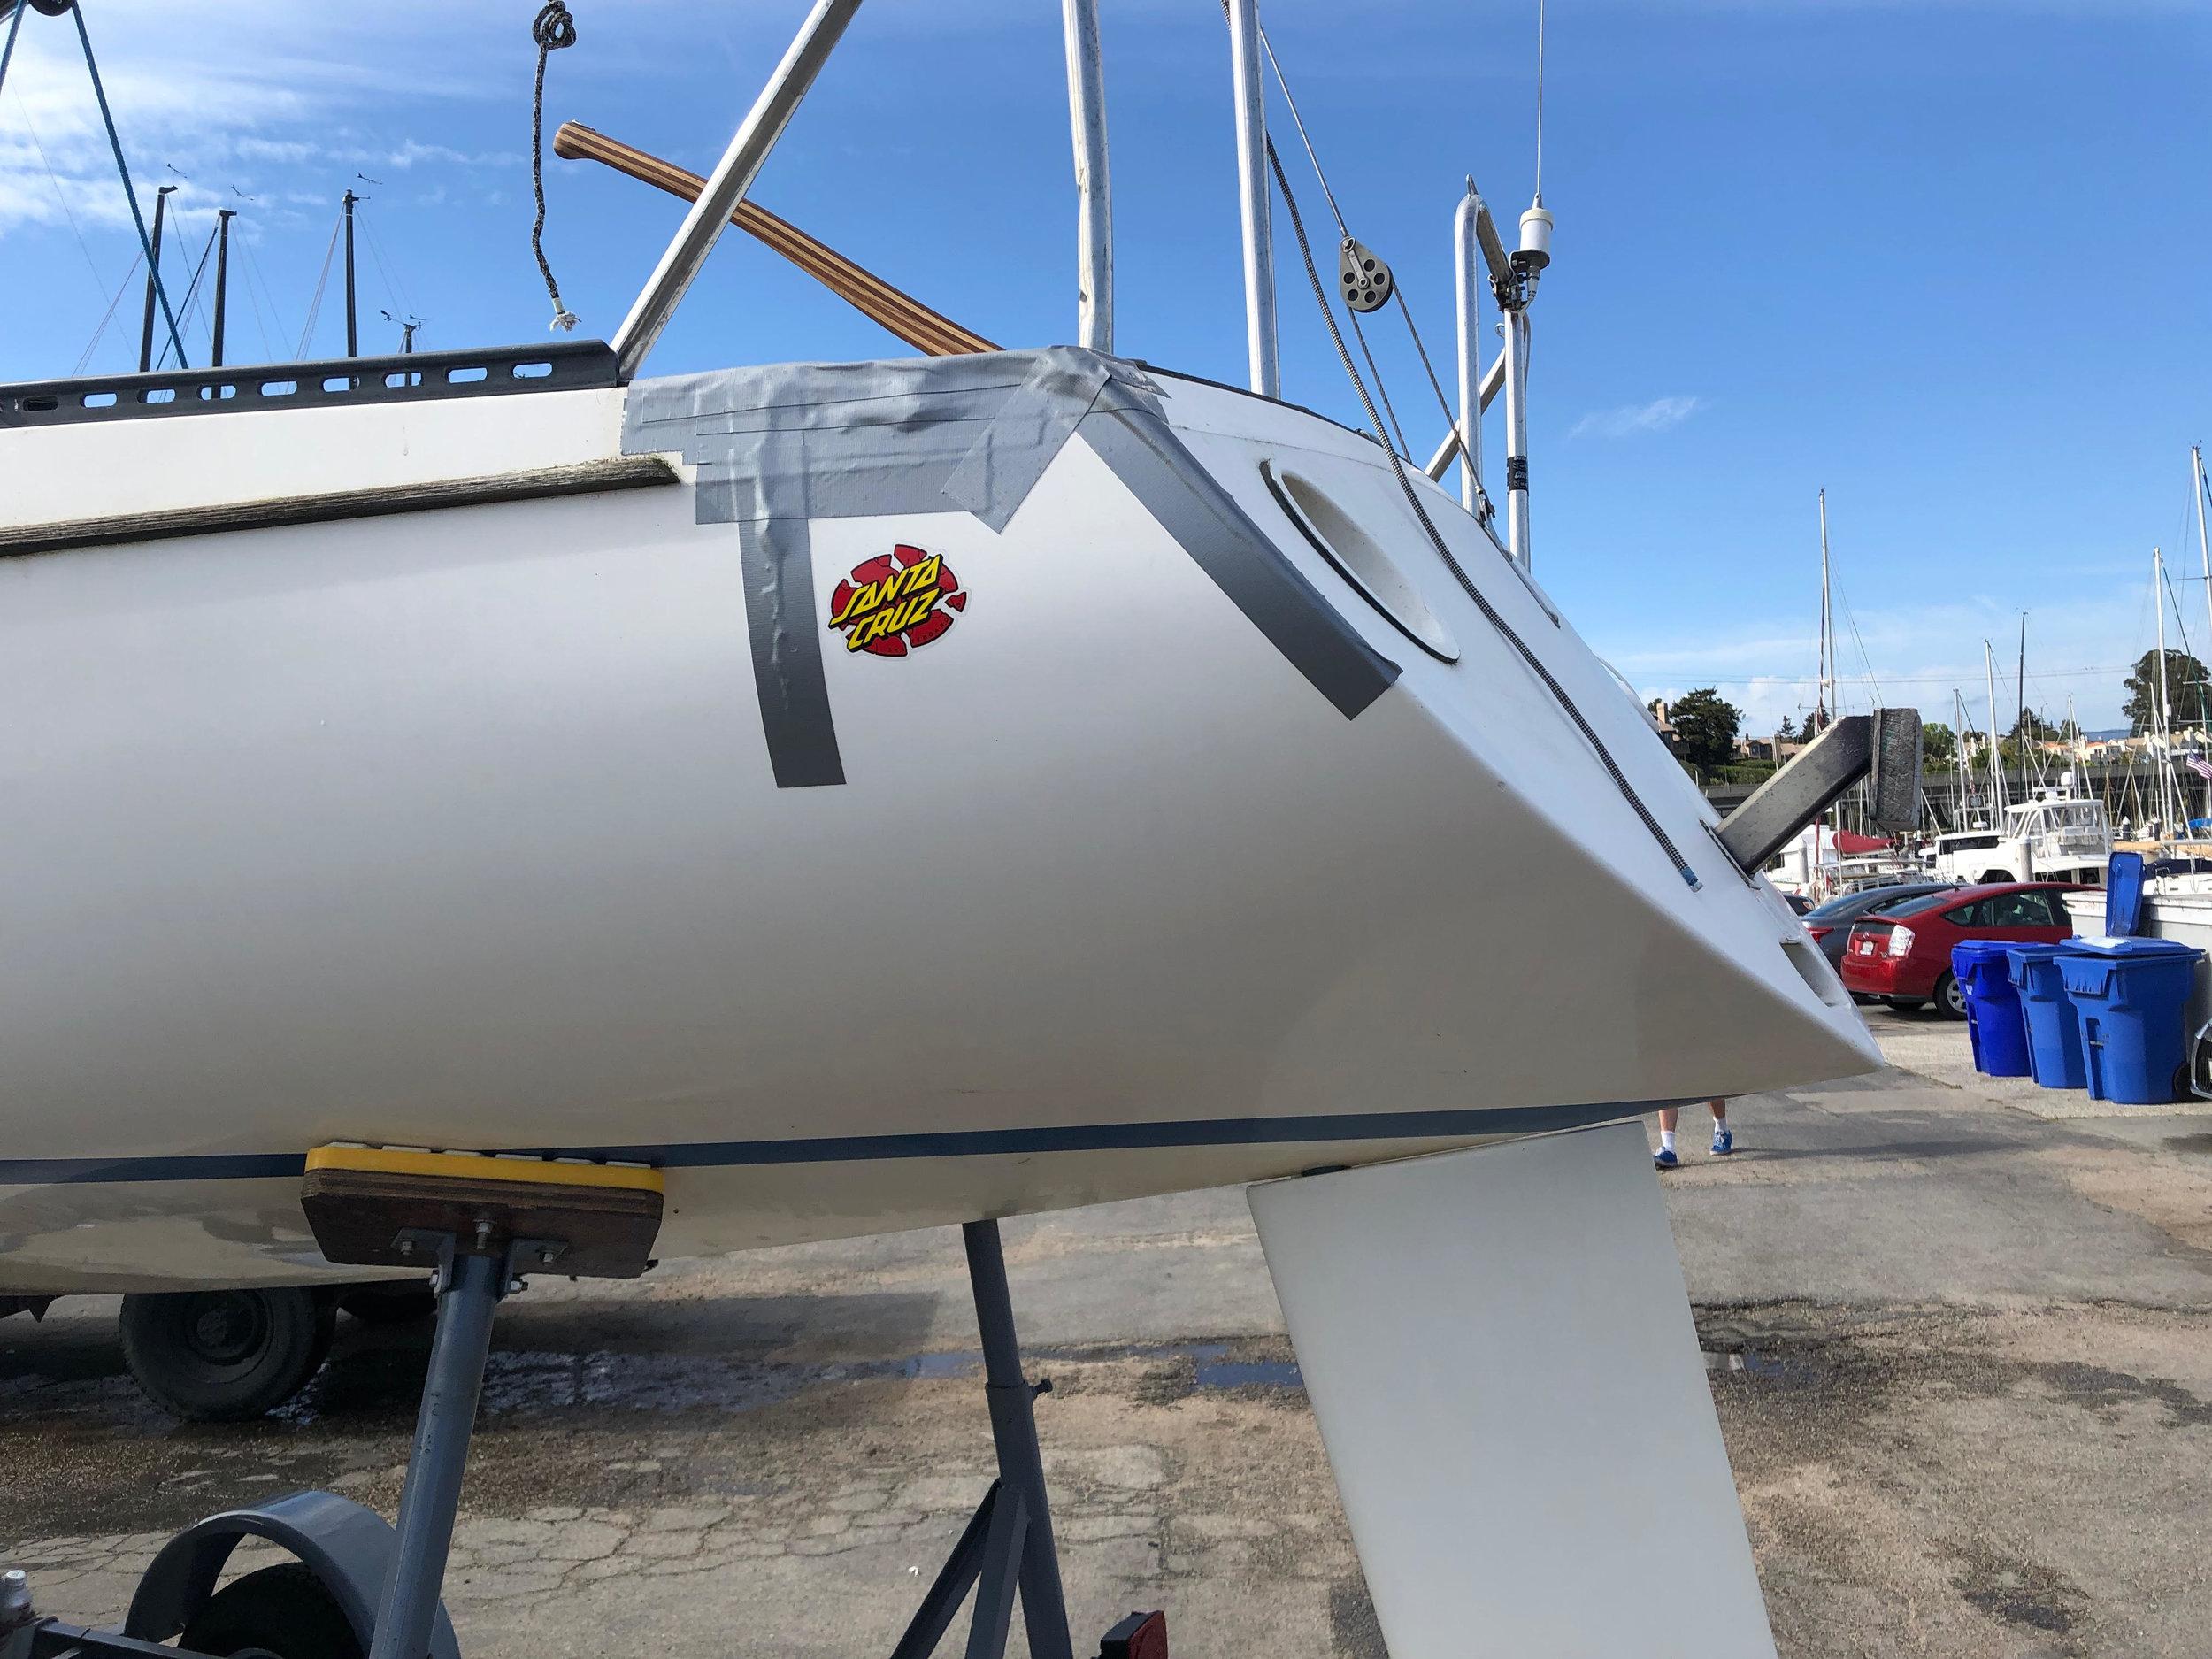 It wouldn't be Santa Cruz without injured boats.